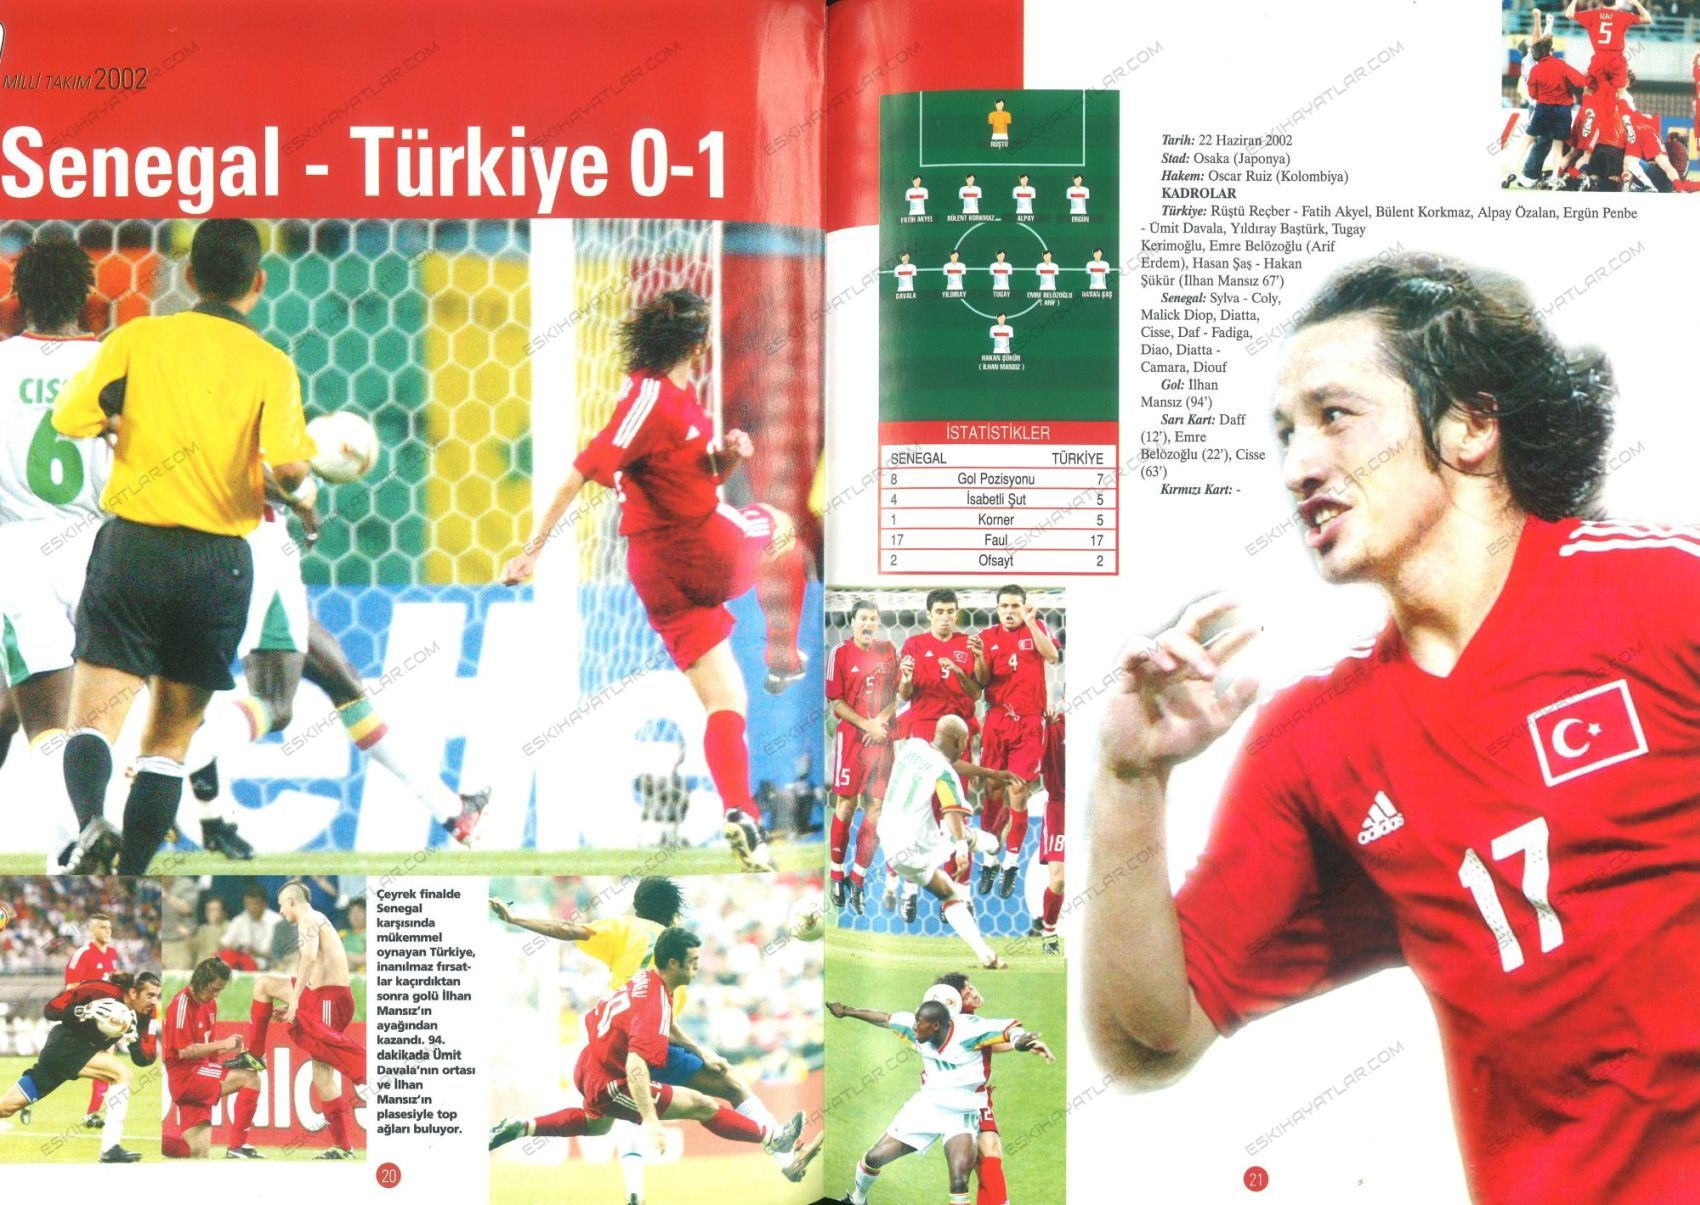 0406-turkiye-a-milli-takimi-2002-dunya-kupasi-kadrosu-aktuel-dergisi (9)